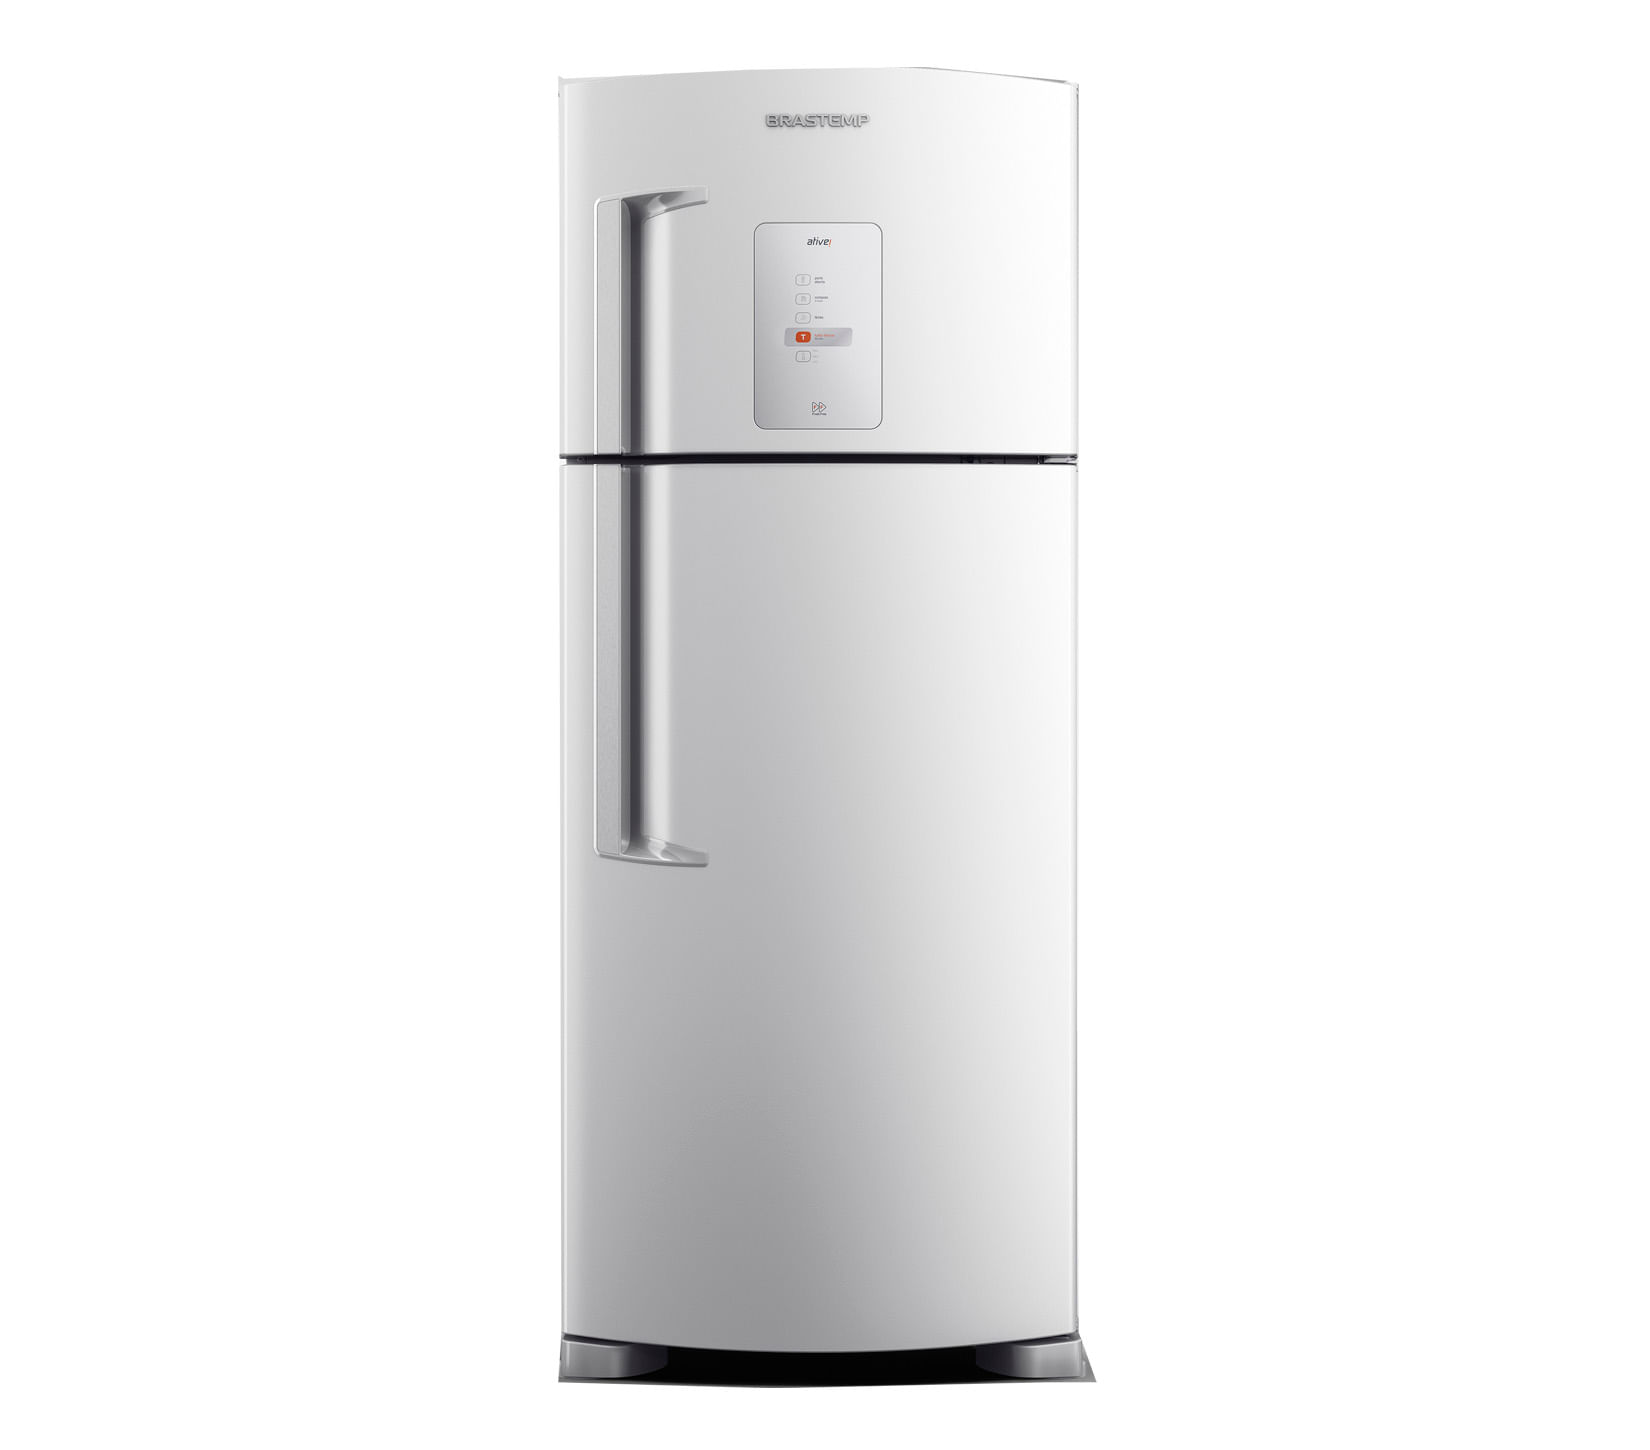 Geladeira Brastemp Frost Free Duplex 403 litros Branca com Twist Ice